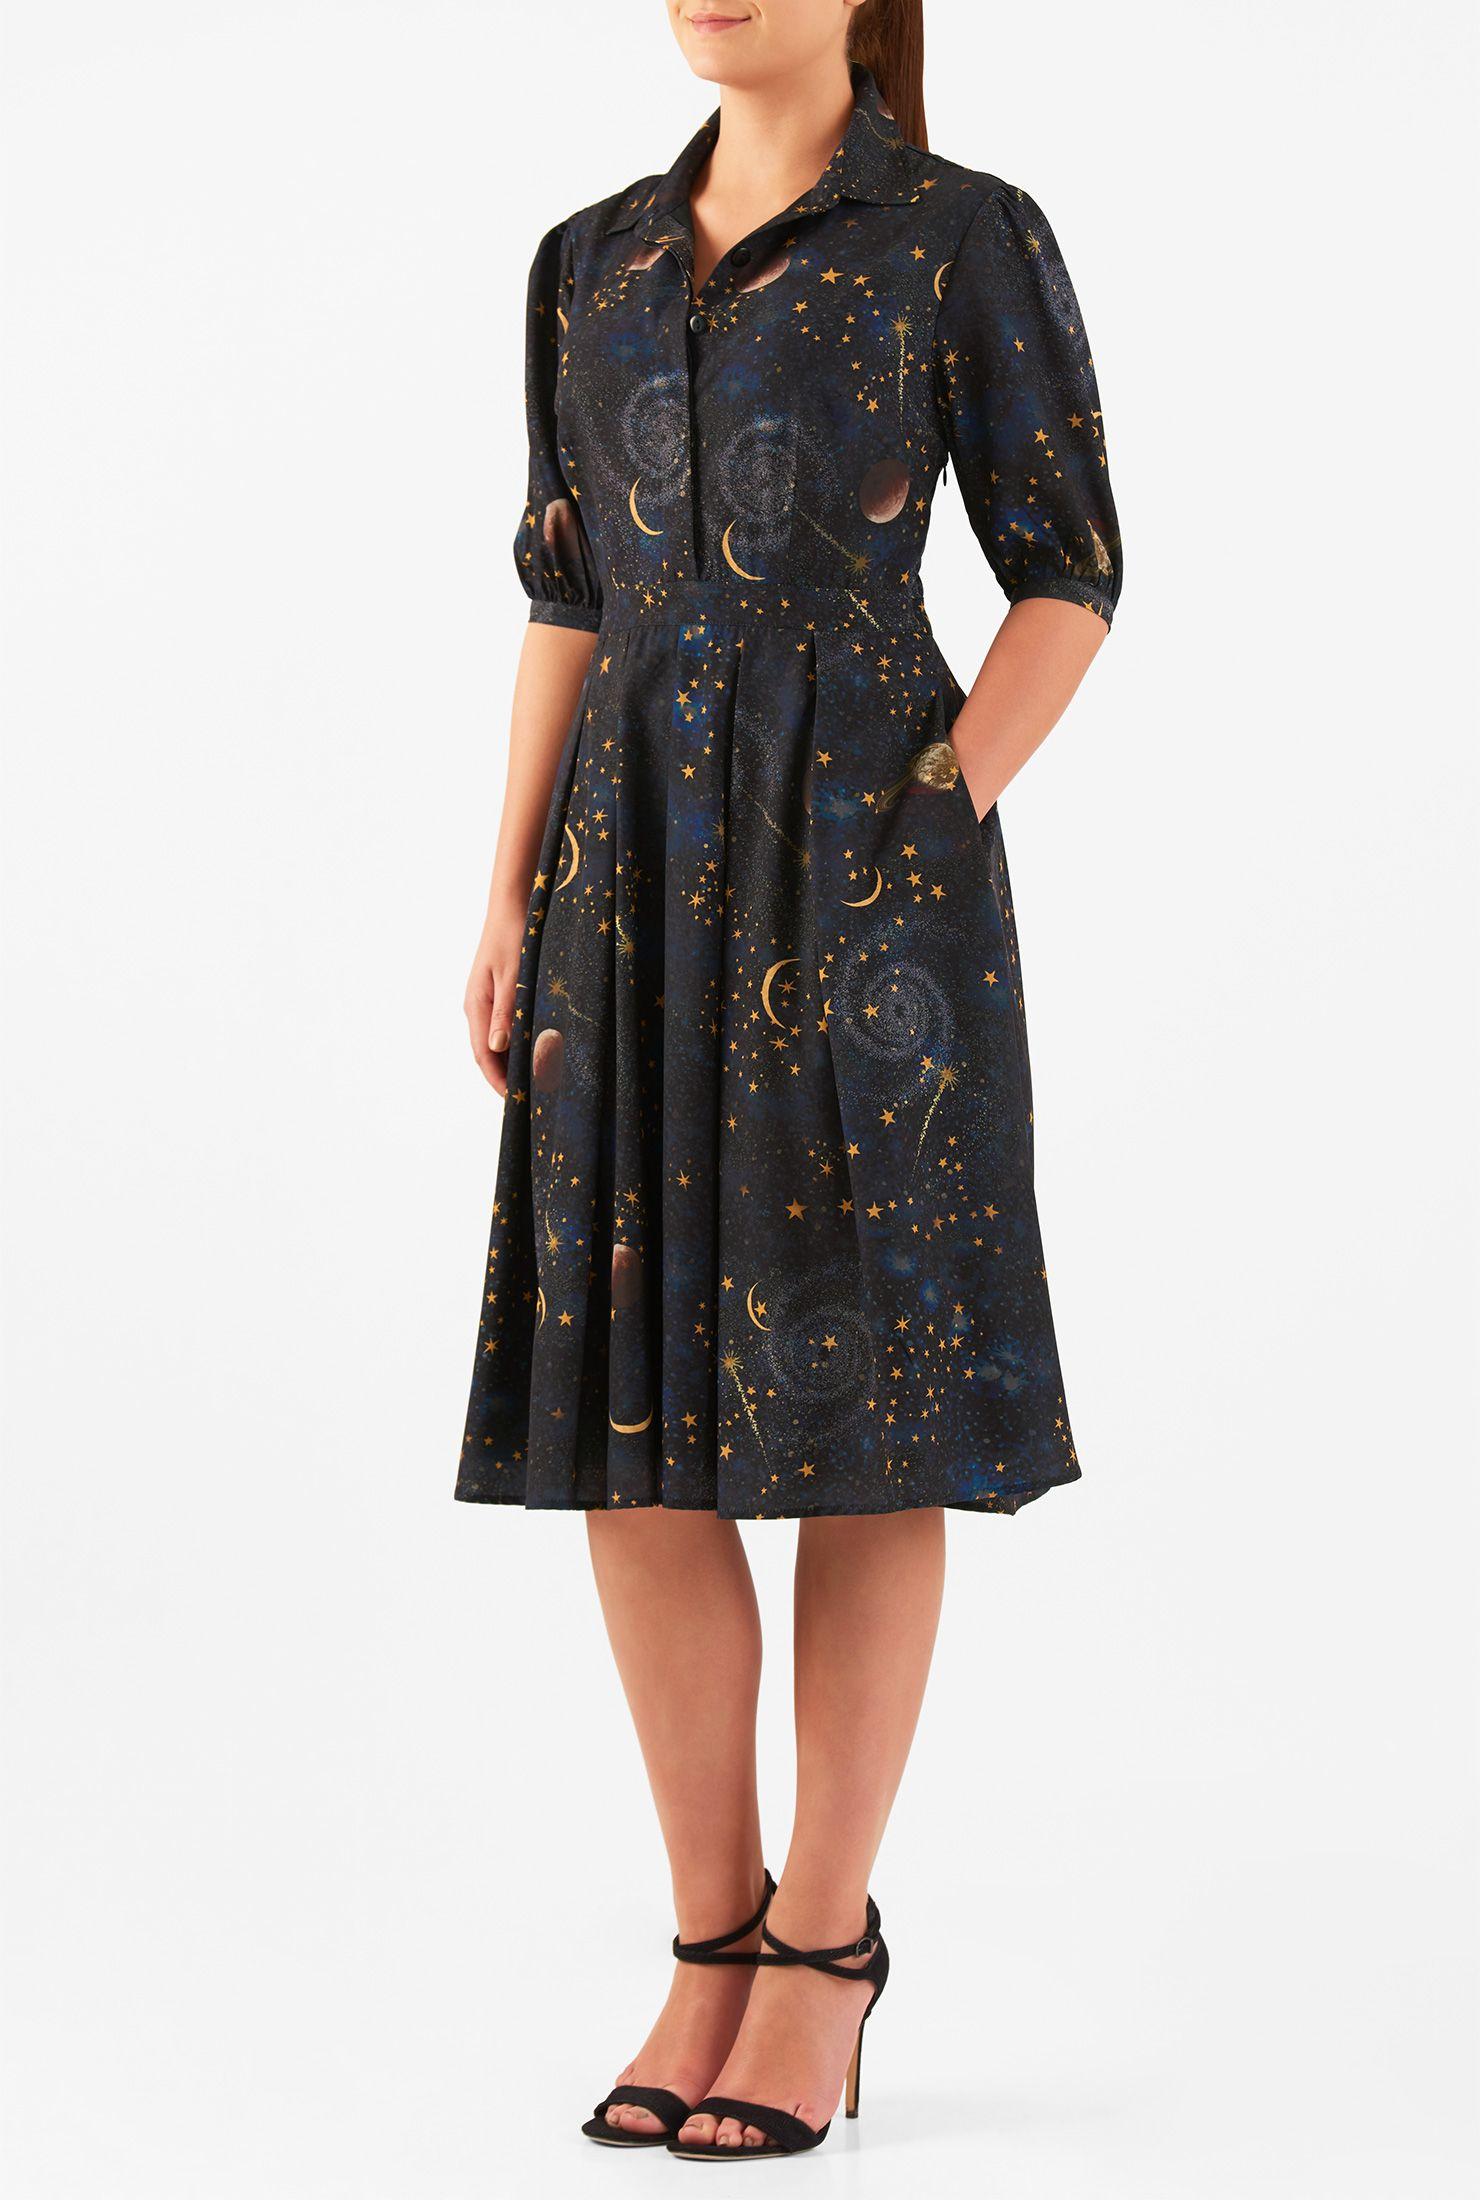 Constellation Dress